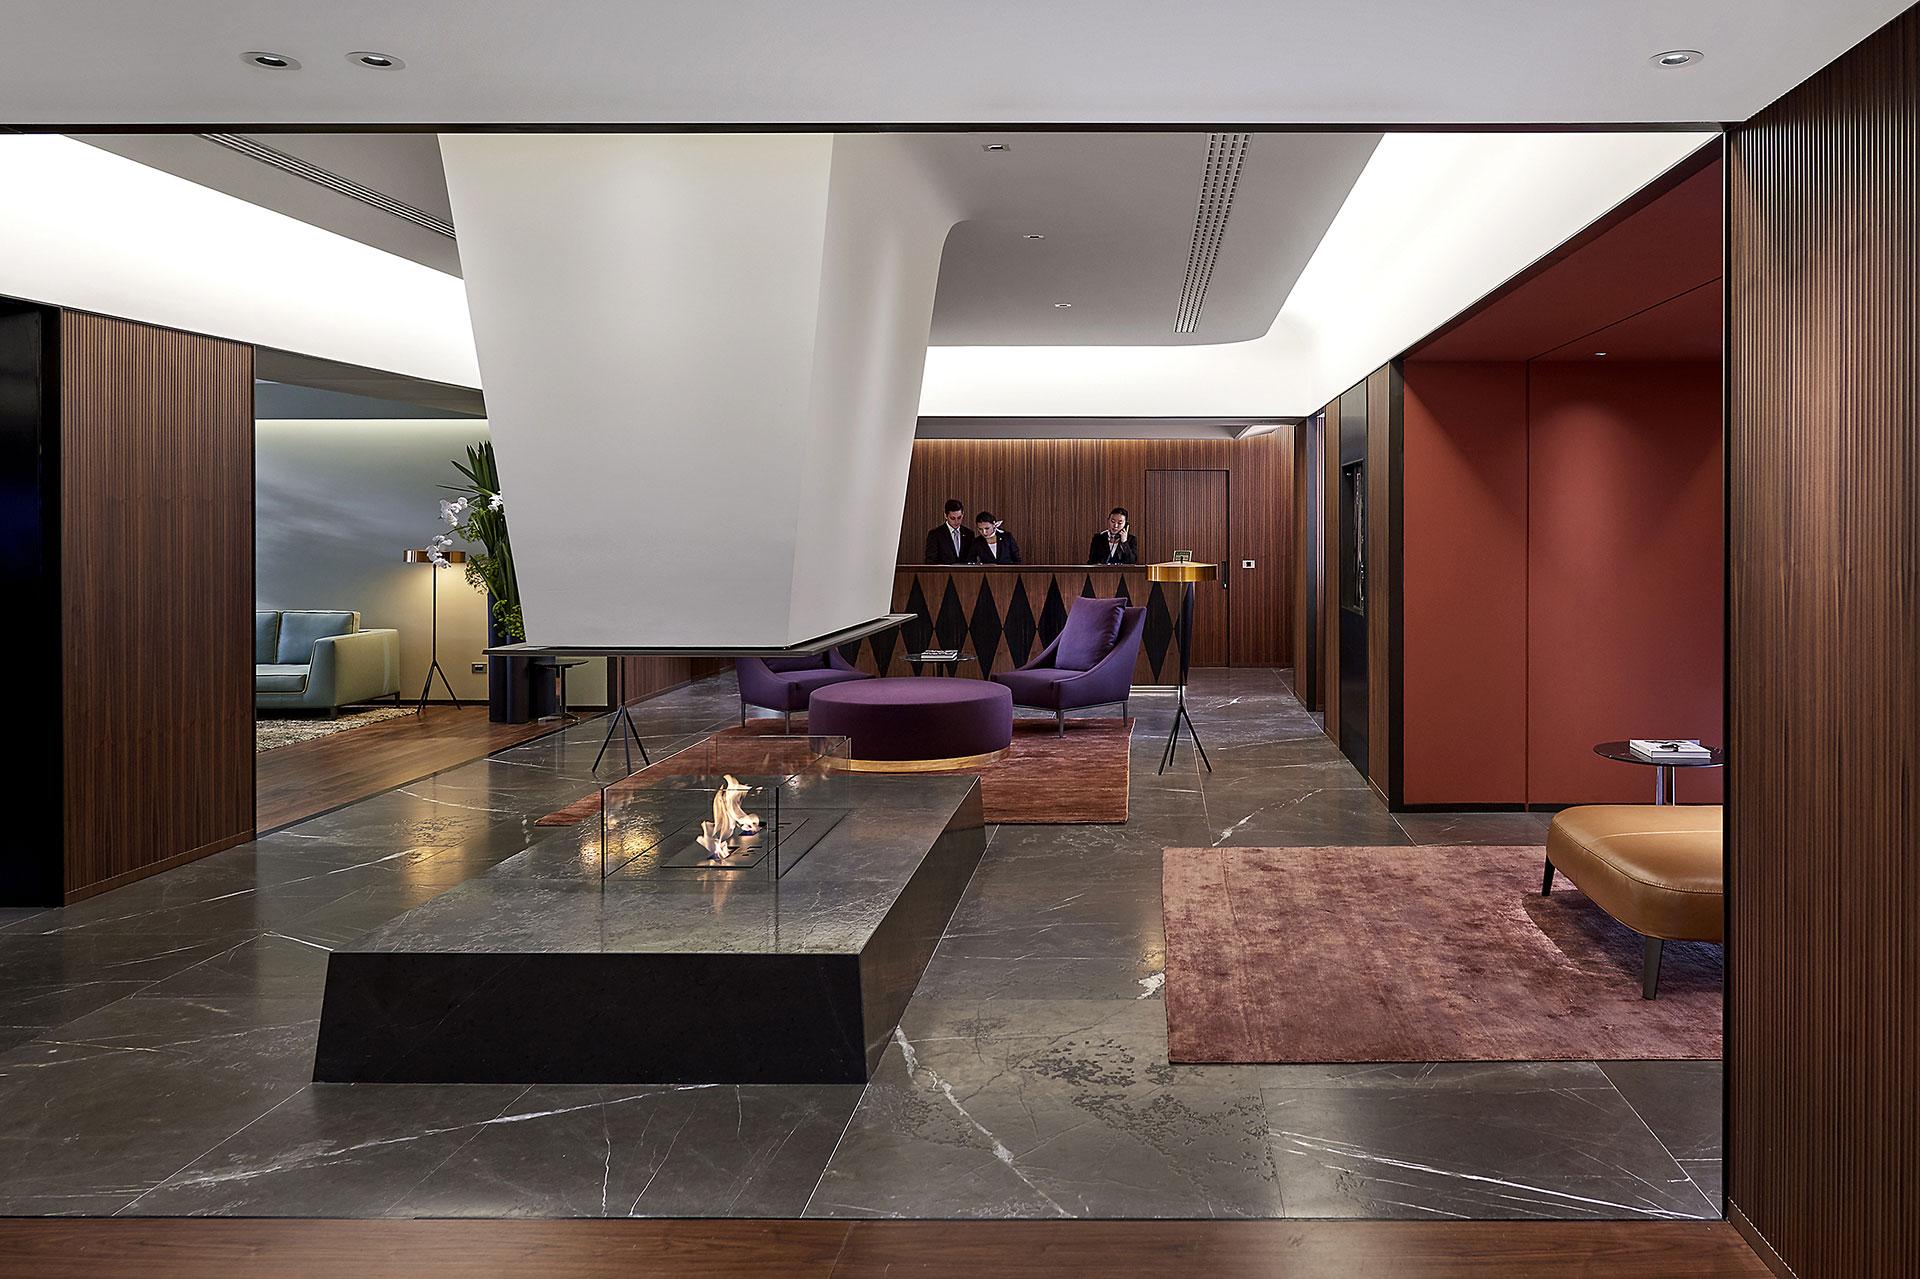 HOTEL MANDARIN ORIENTAL 4